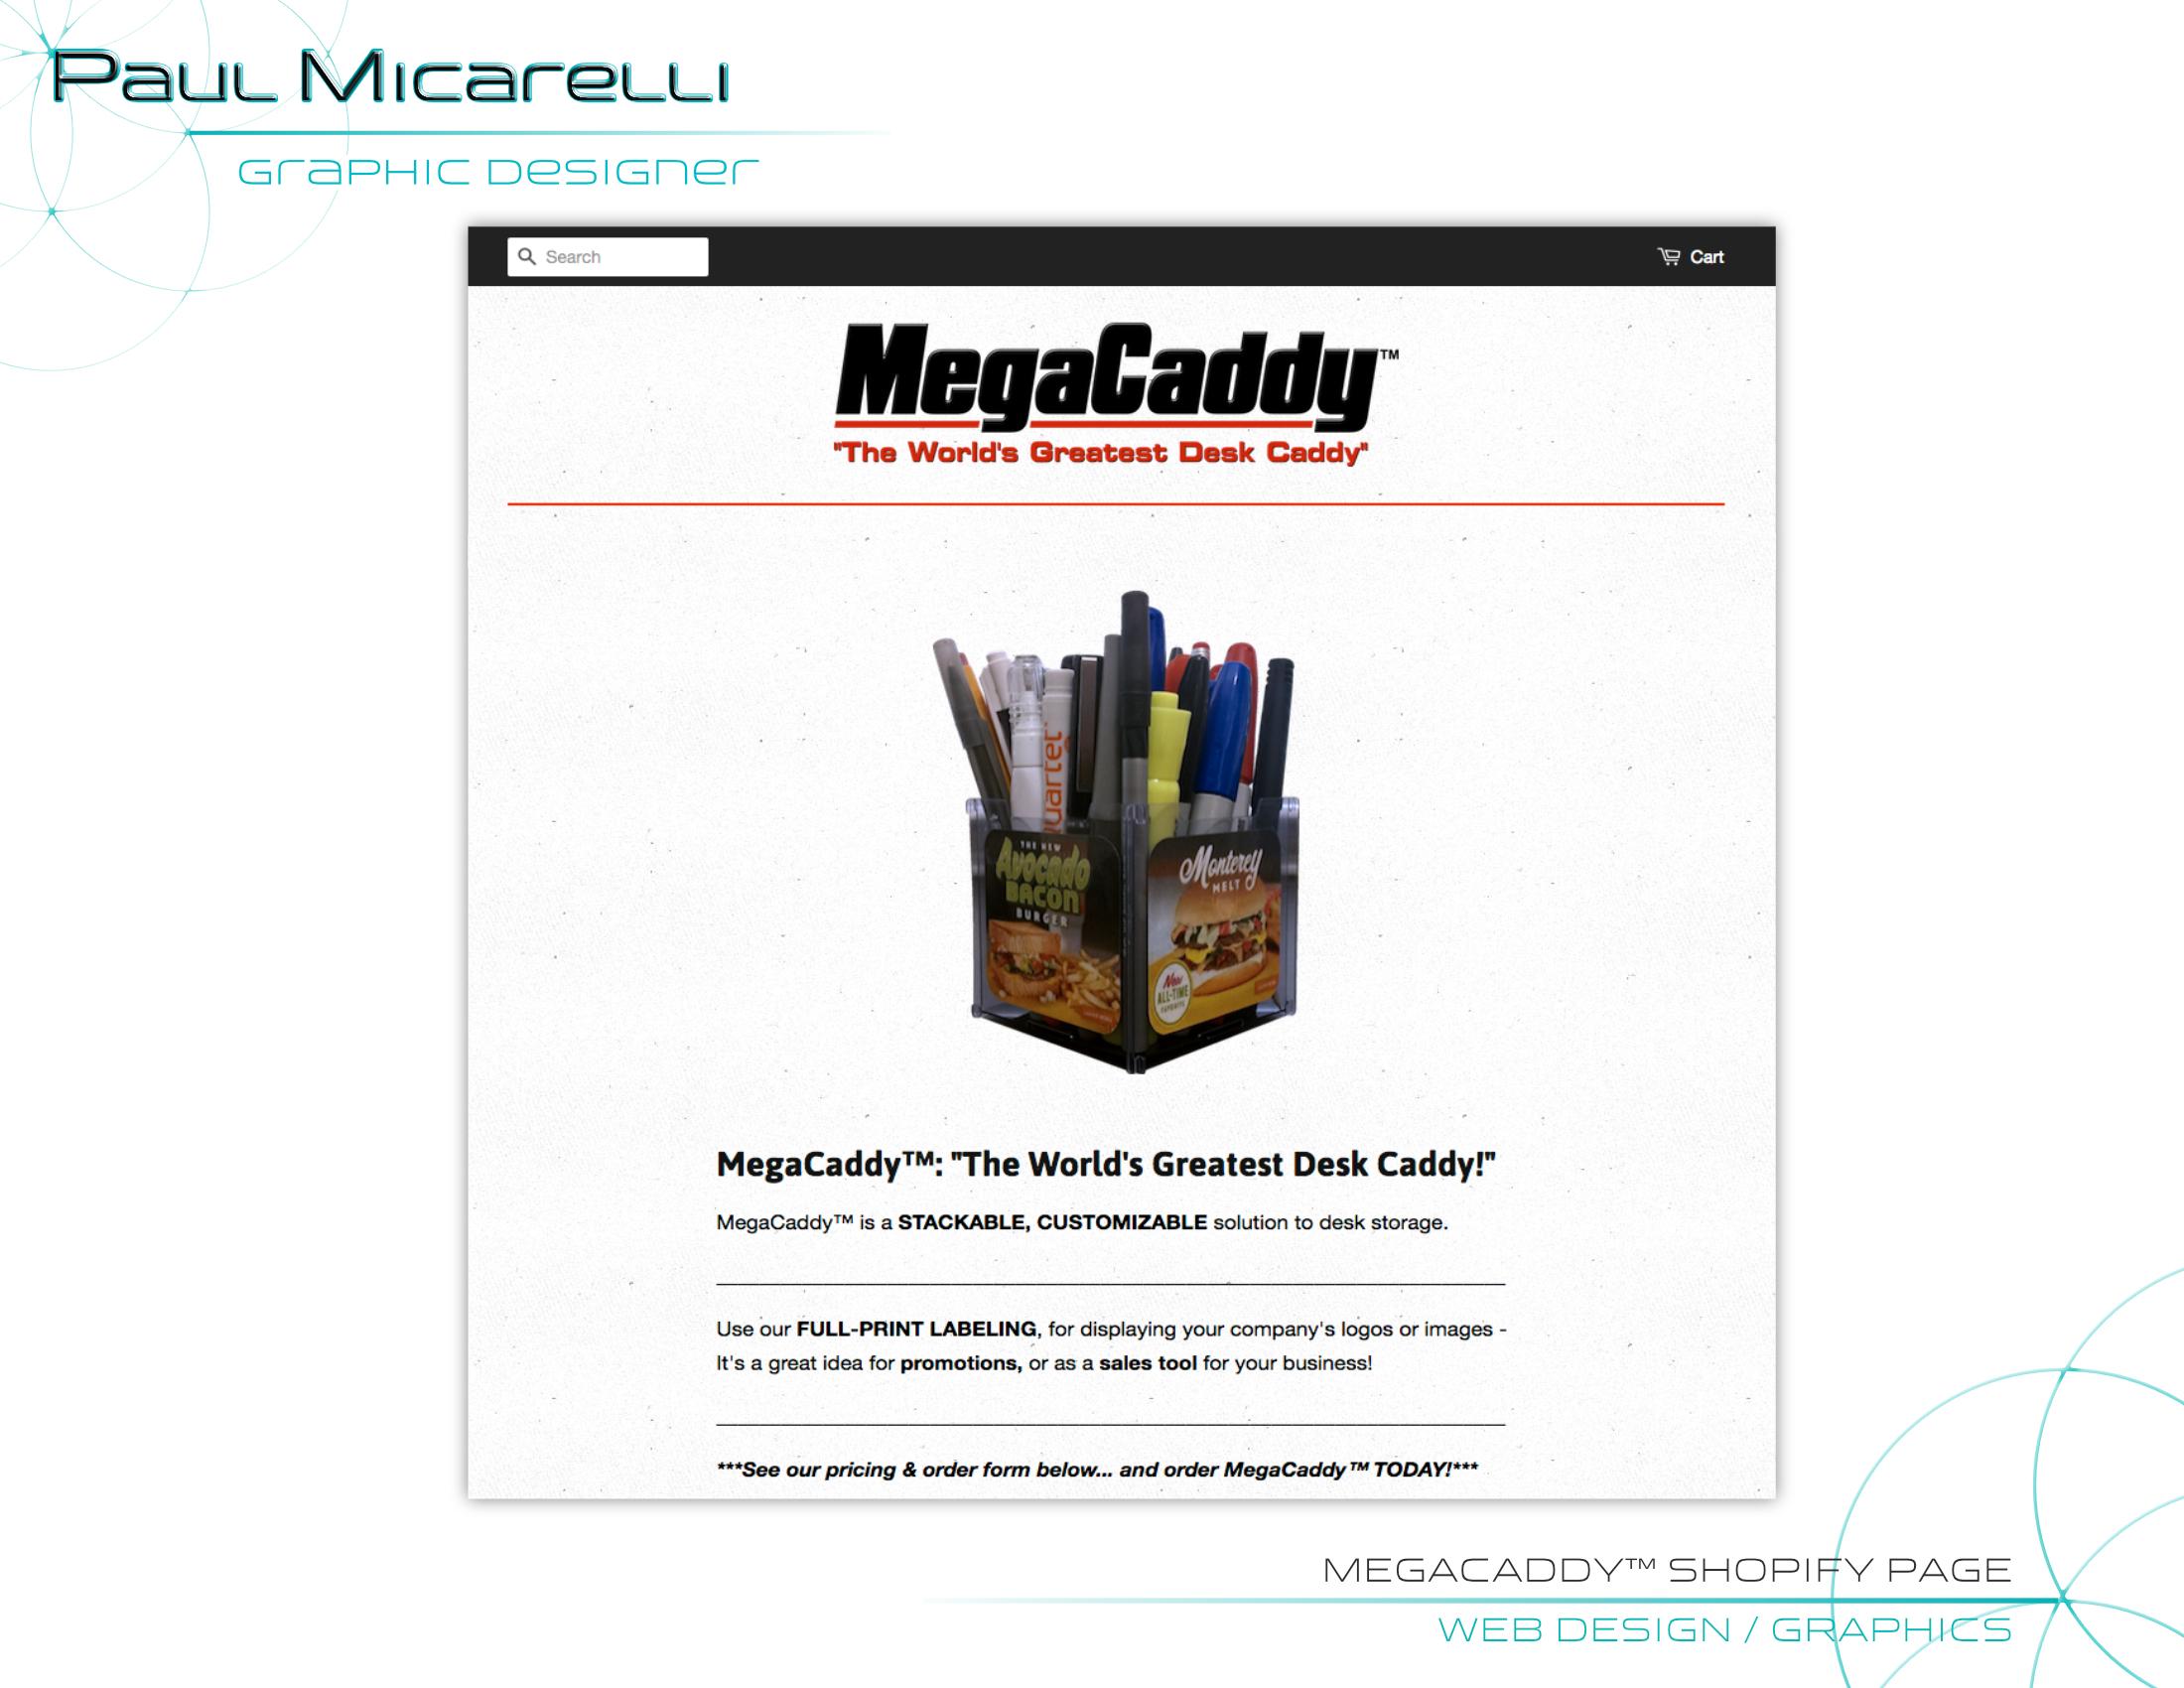 Paul-Micarelli-MegaCaddy Webpage